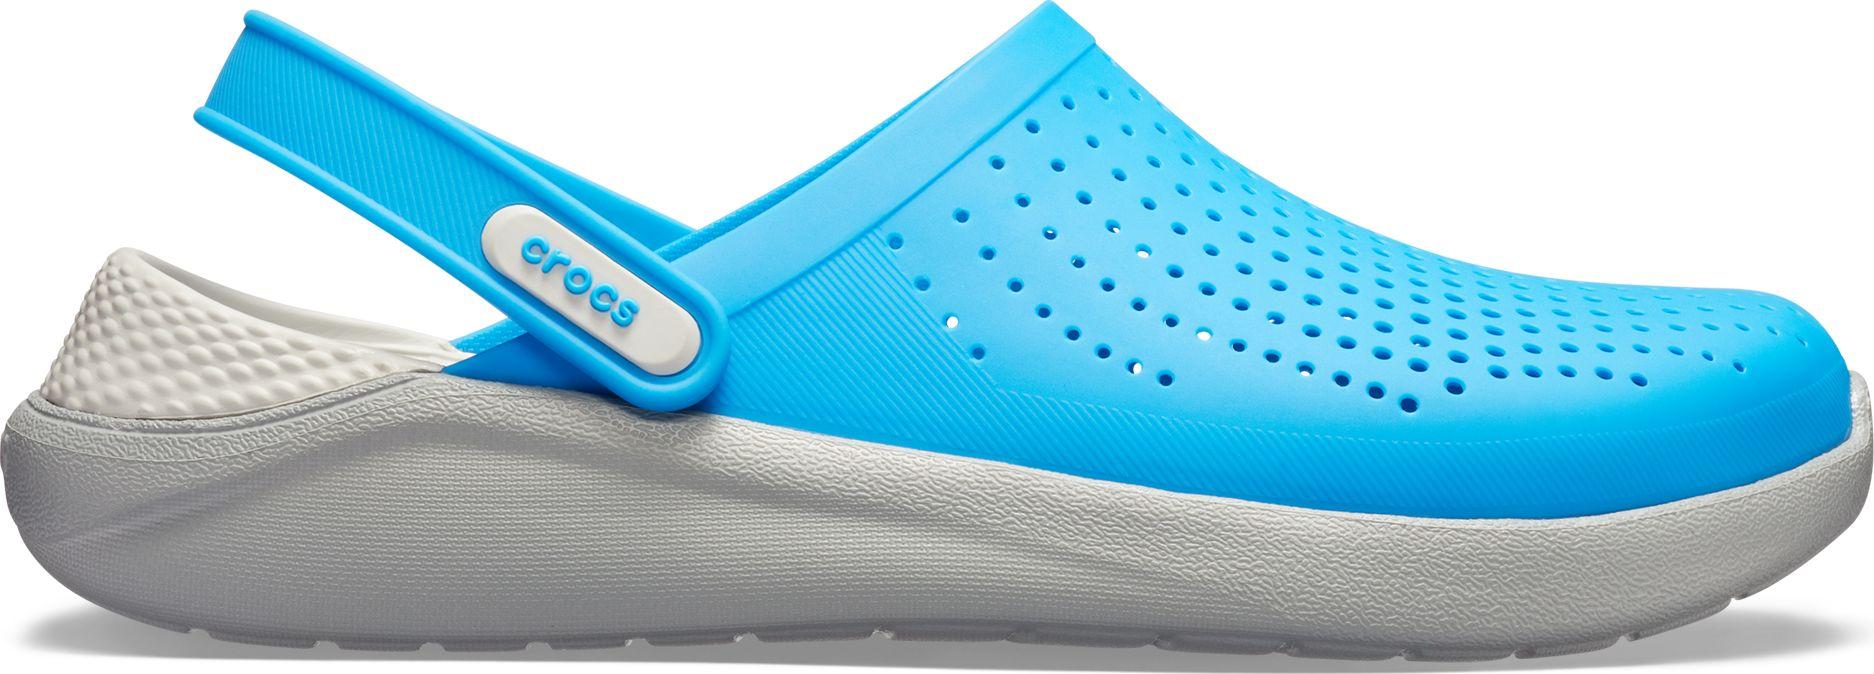 Crocs™ LiteRide Clog Ocean/Light Grey 45,5